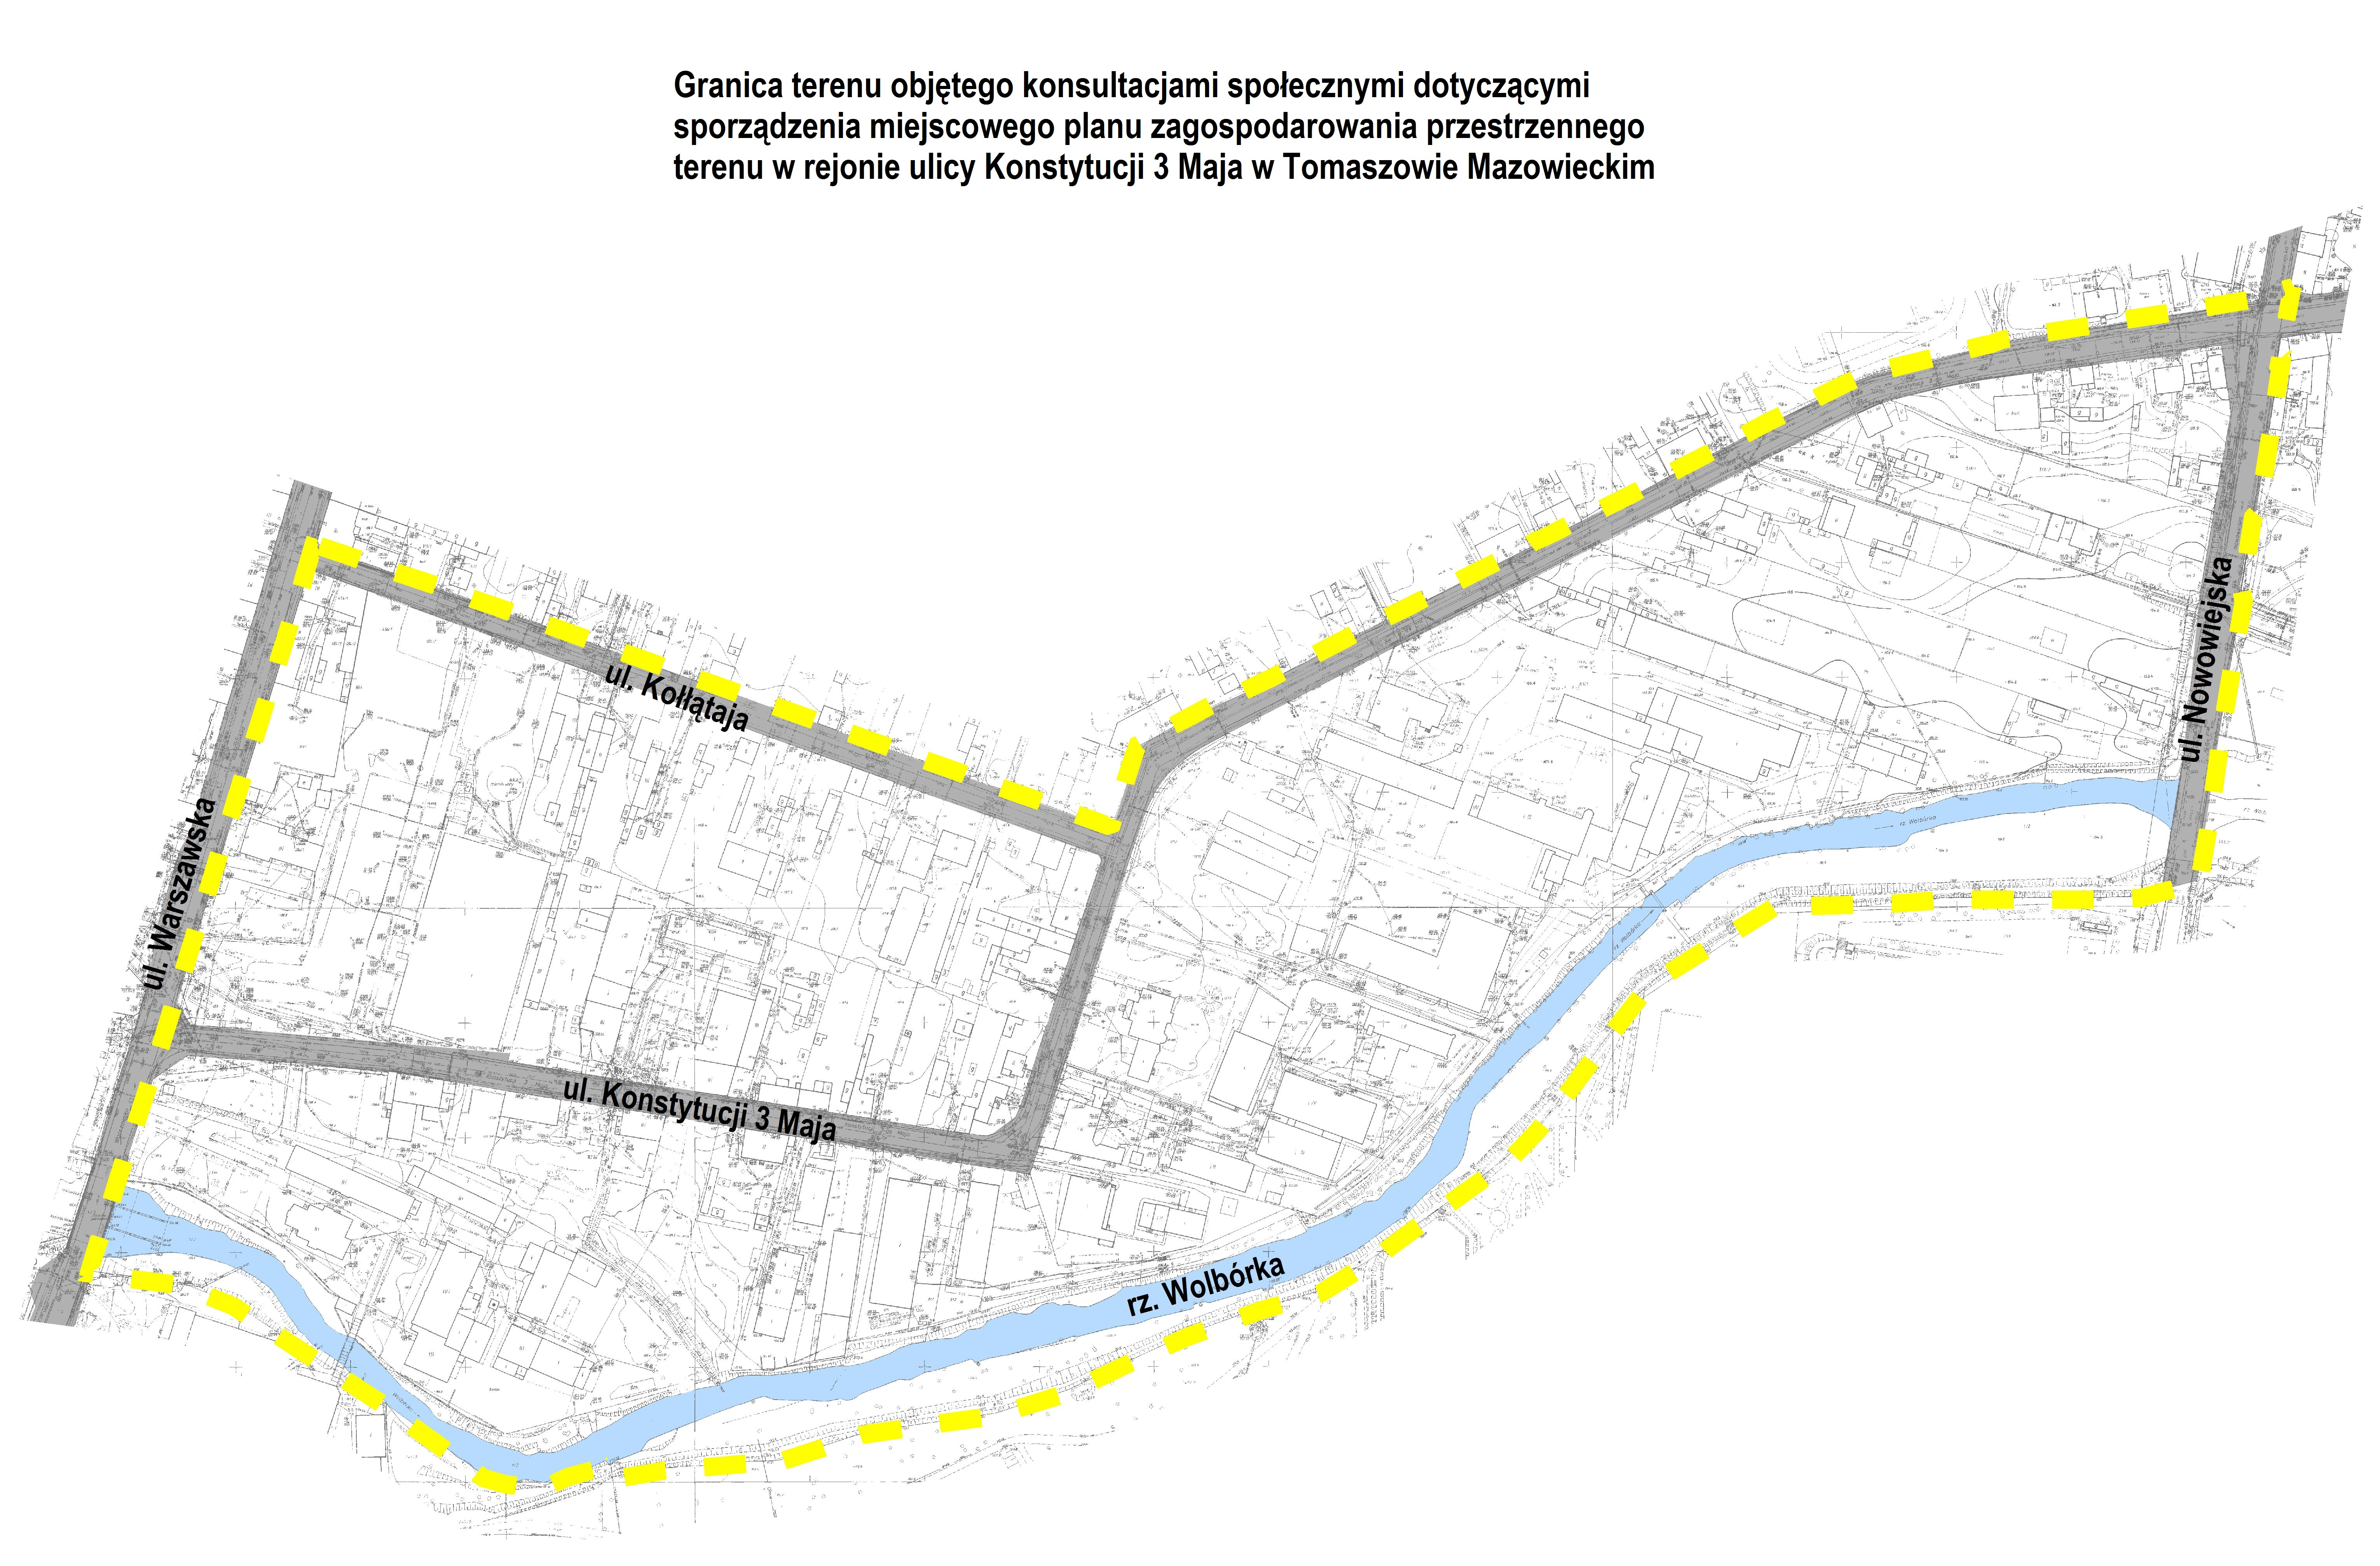 Mapa terenu objętego konsultacjami